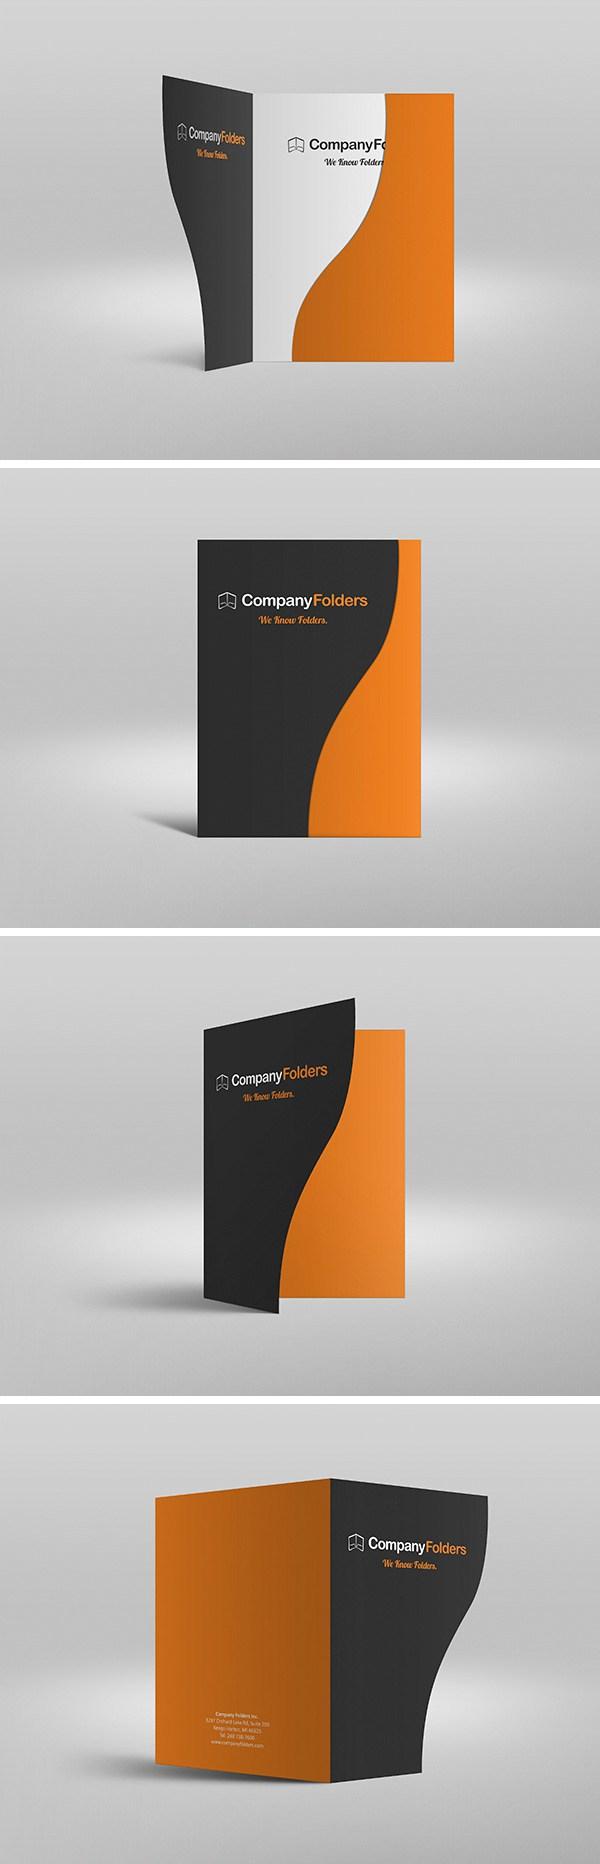 Serpentine Presentation Folder Mockup Mockup Catalog